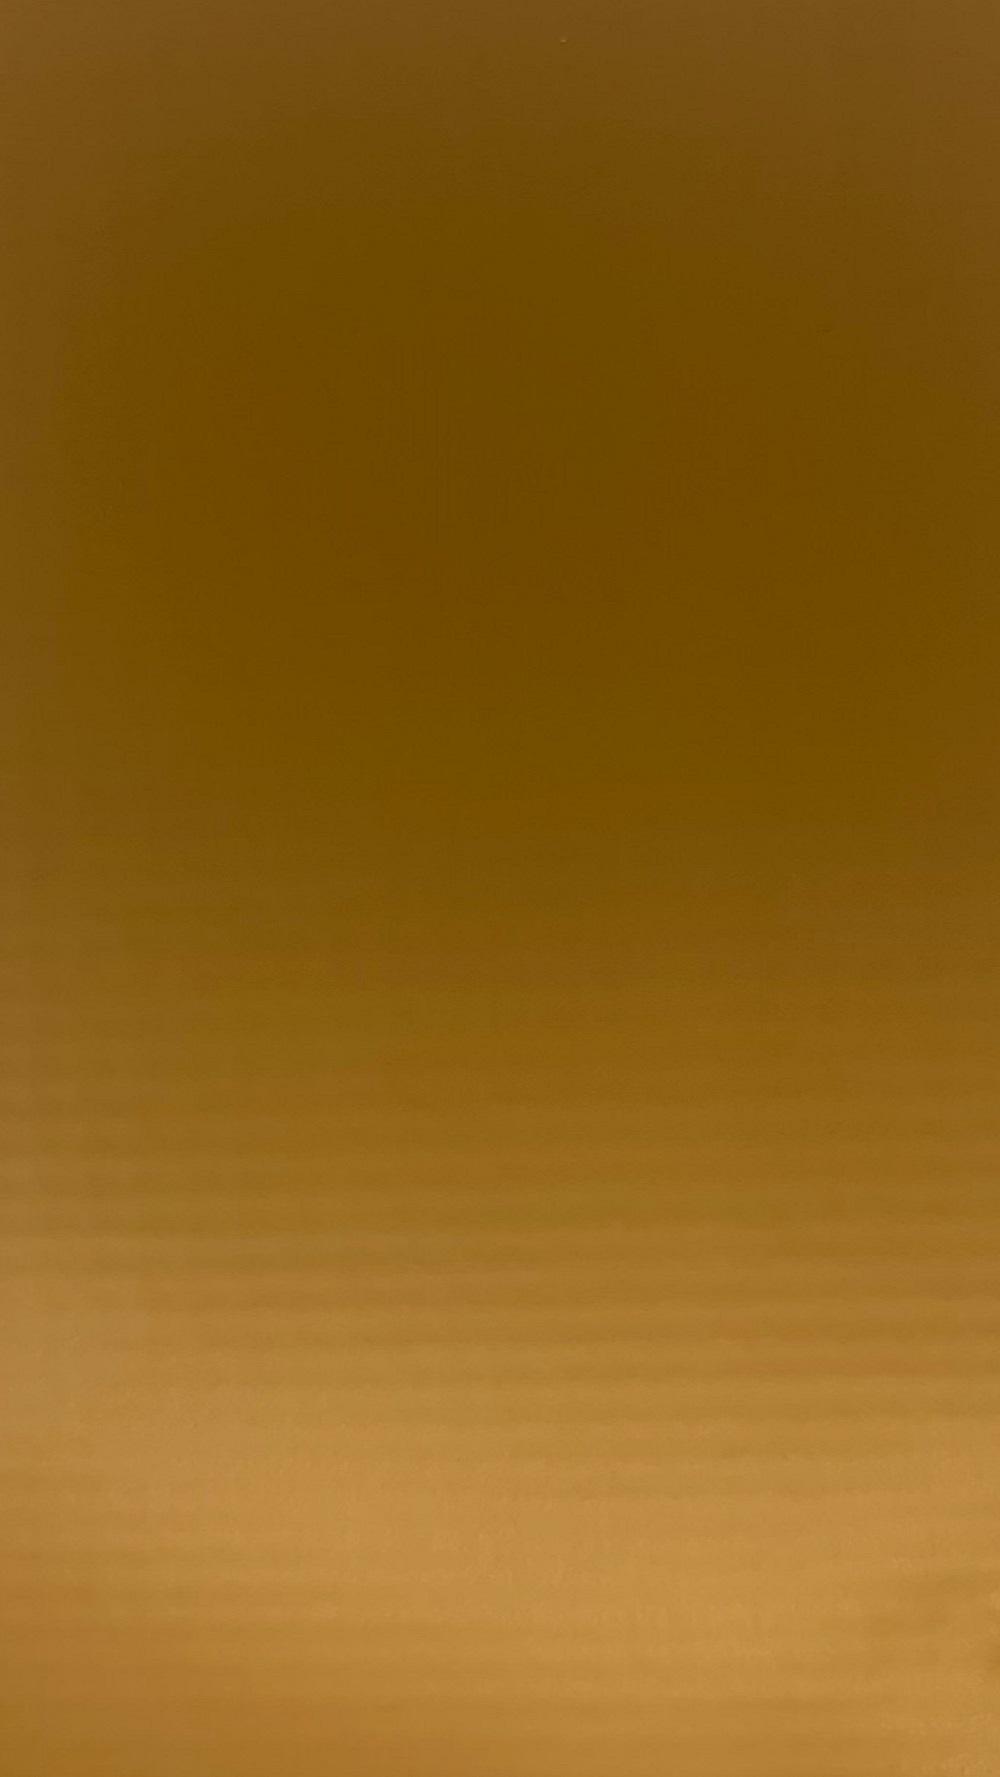 Lona Vinilona Df Fosca Marrom S-161 1,45mt X 1,0mt